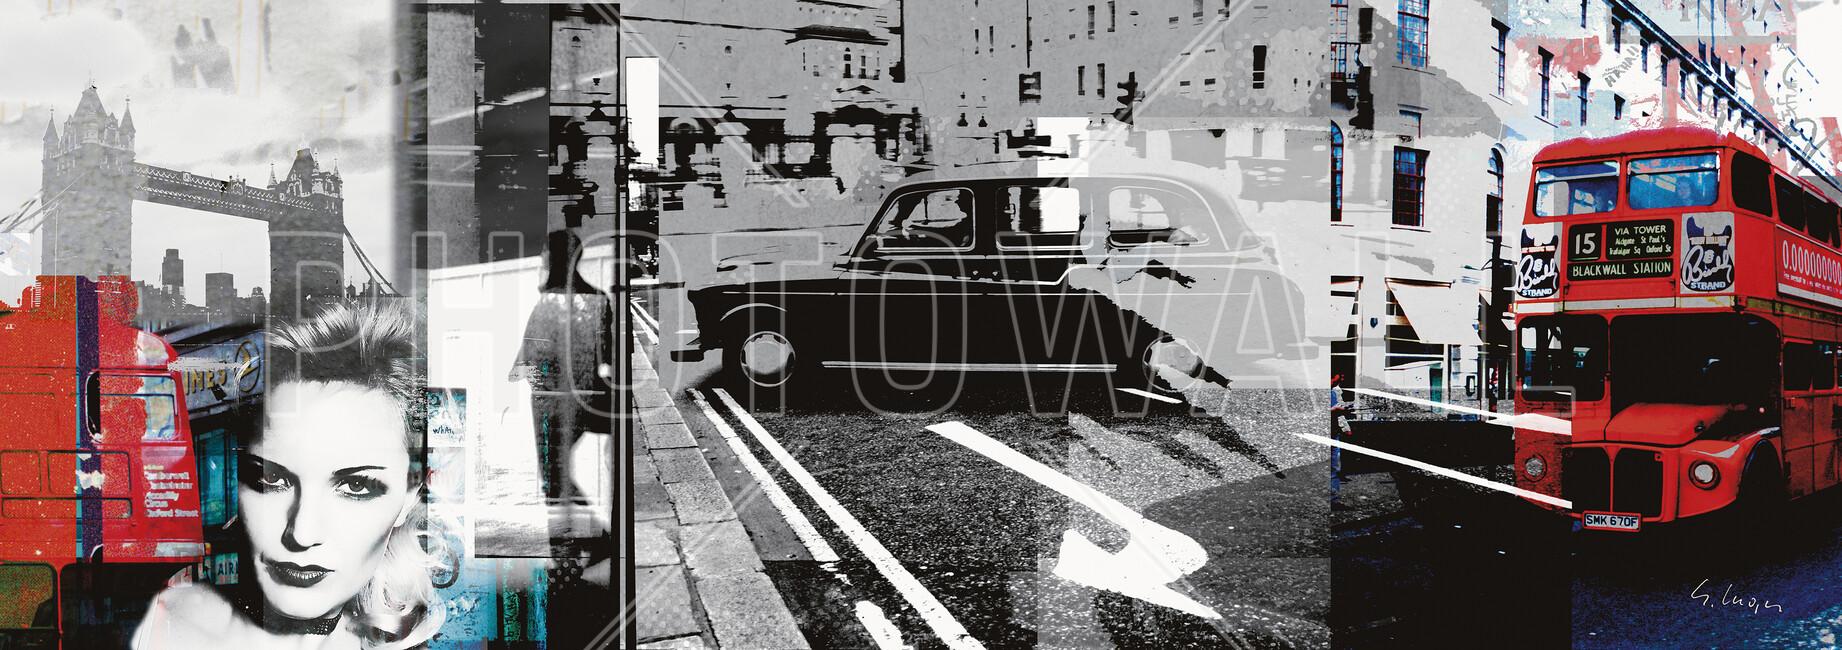 London fotobehang behang photowall - Behang london ...